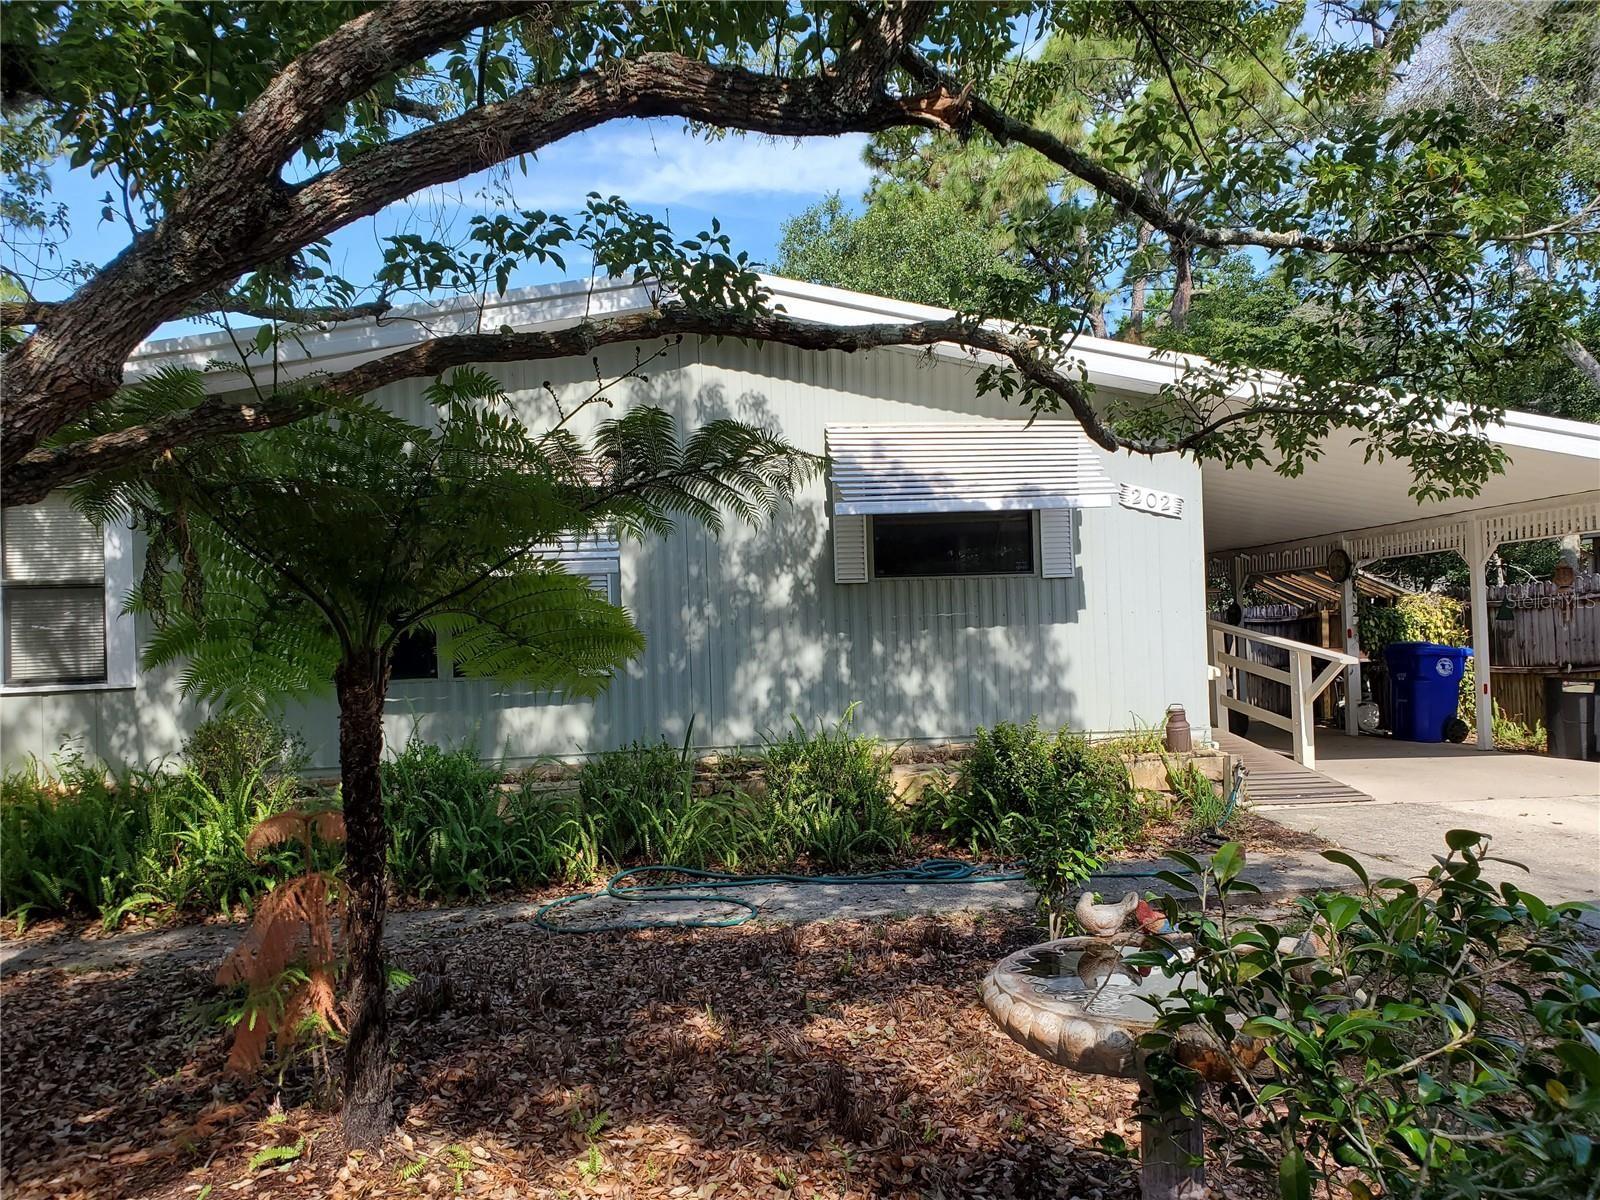 202 W PAMPAS GRASS COURT, Lake Mary, FL 32746 - #: O5947097